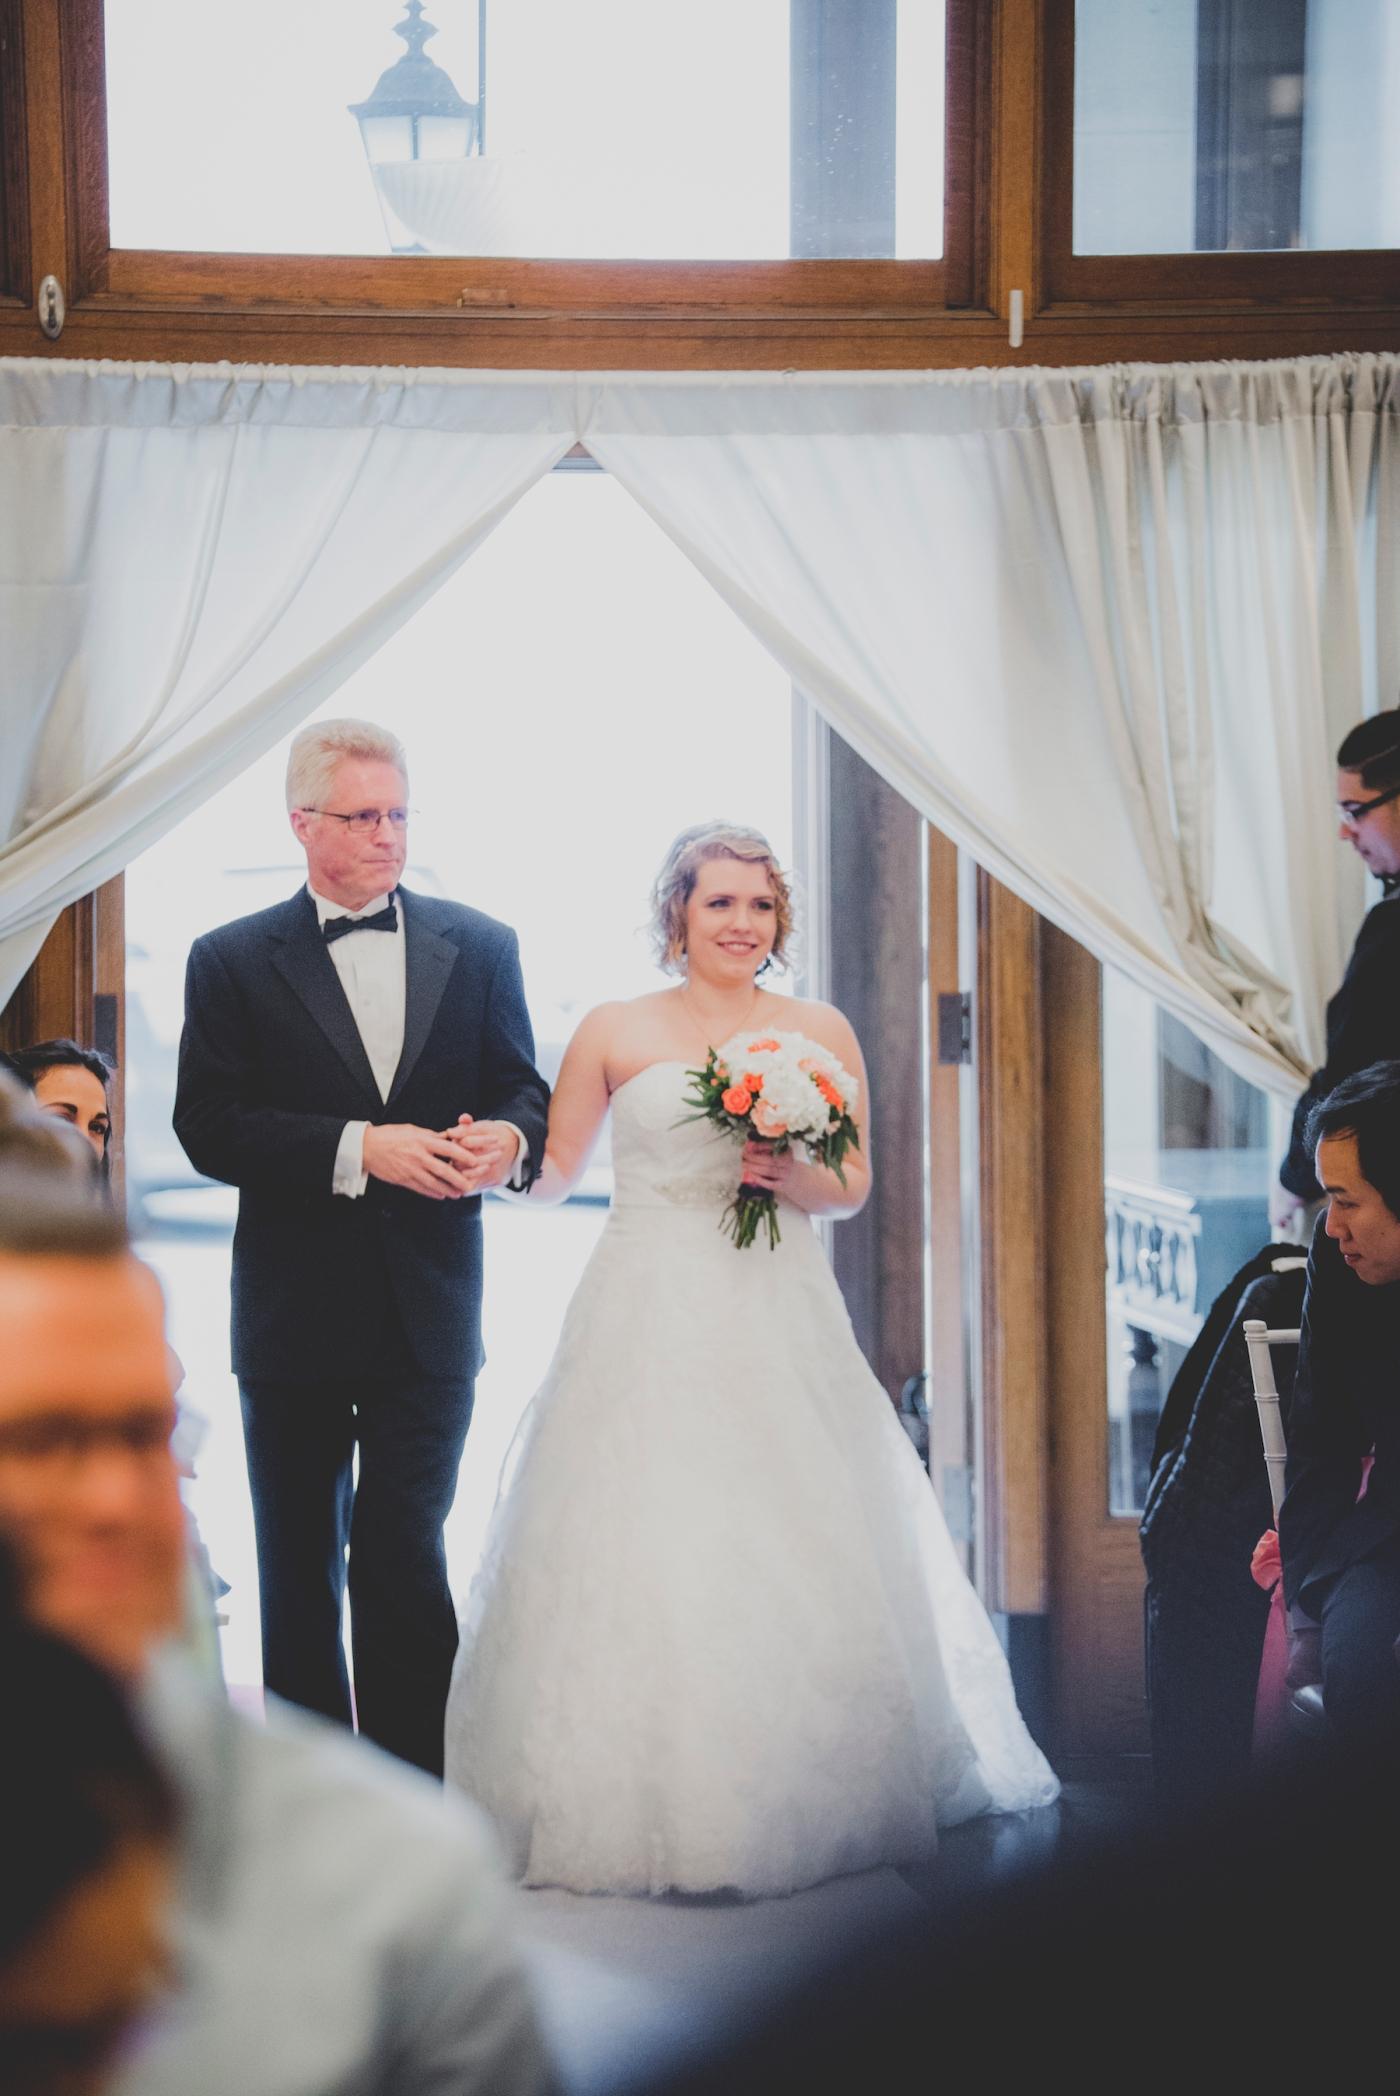 DSC_2561Everett_Wedding_Ballroom_Jane_Speleers_photography_Rachel_and_Edmund_Ceremony_2017